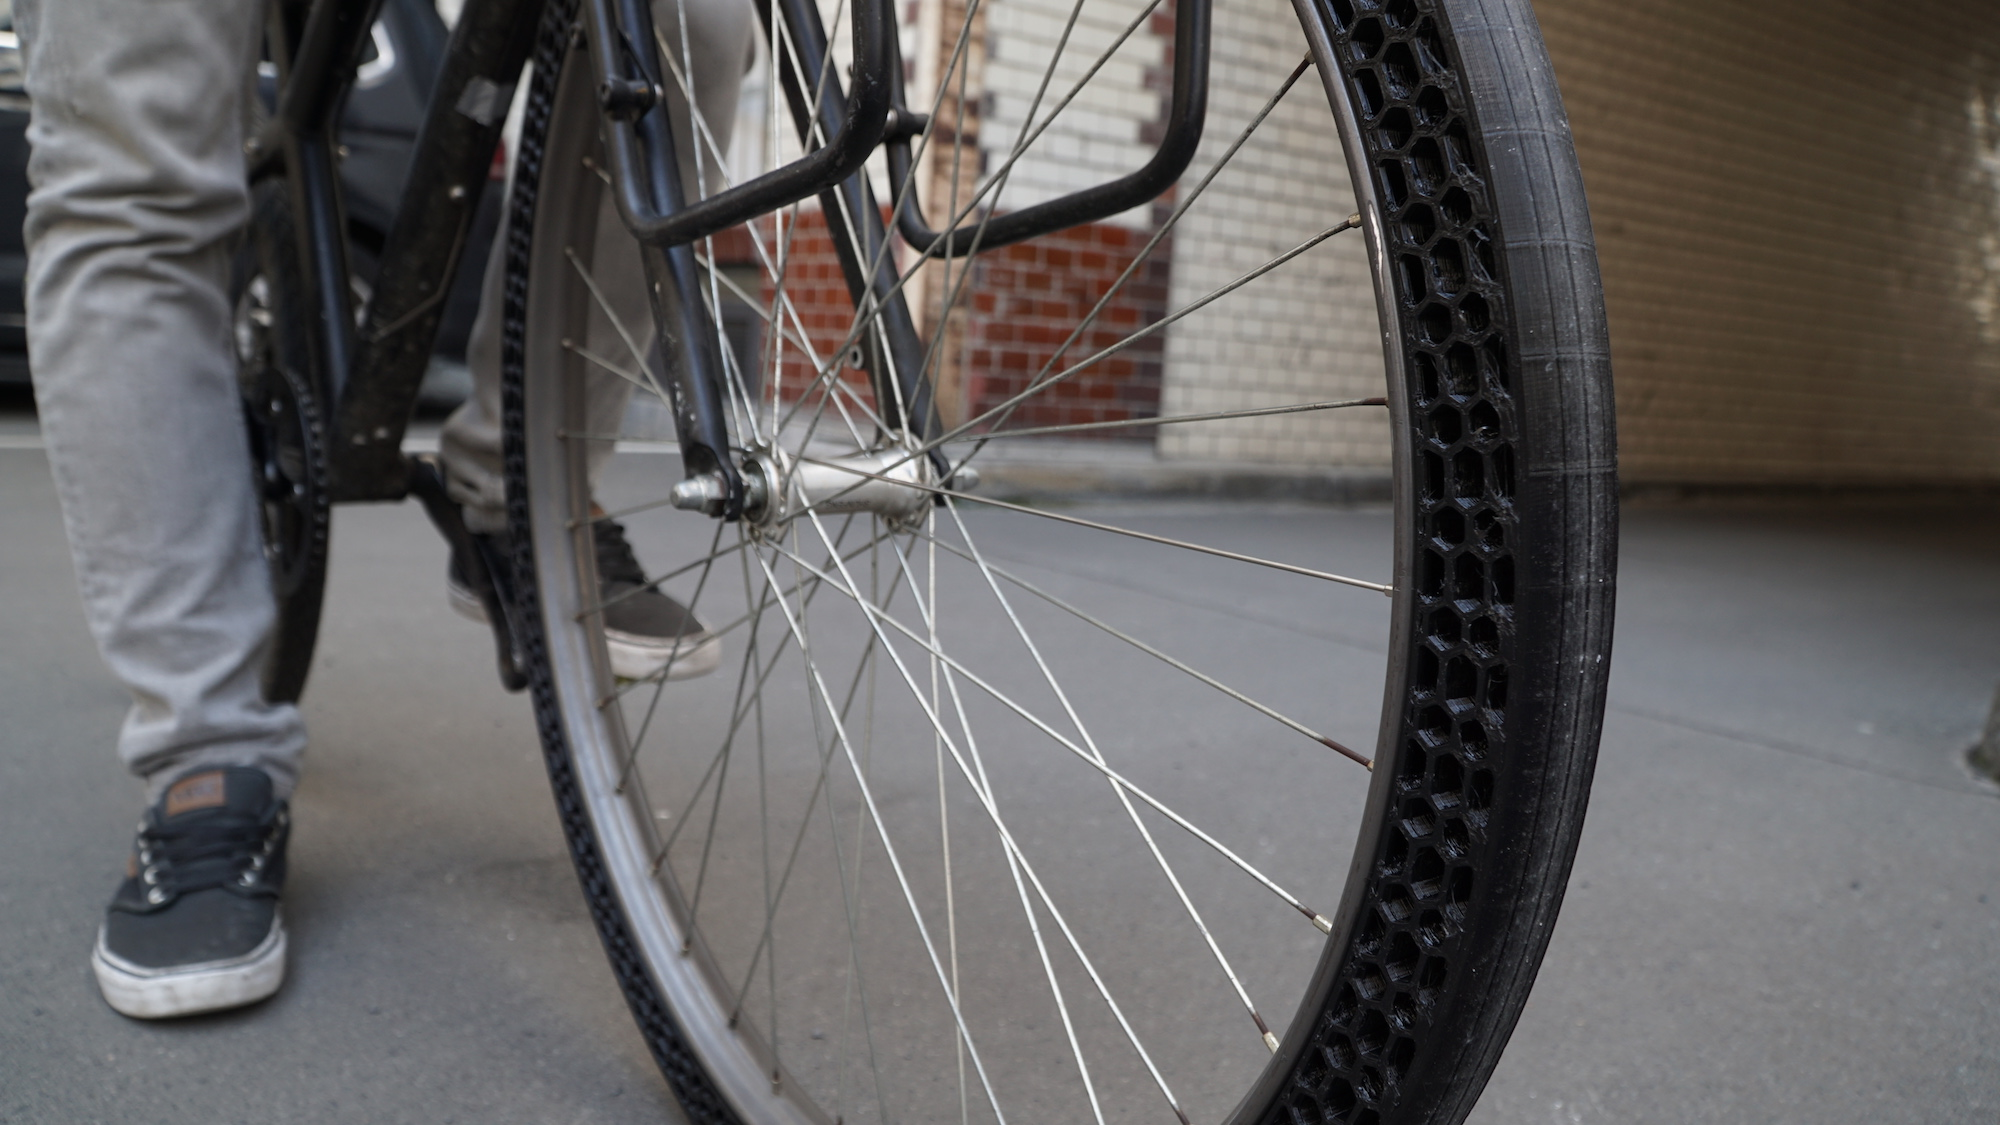 airless fahrradreifen 3d Gedruckt bigrep1 - Erster 3D-gedruckter airless Fahrradreifen